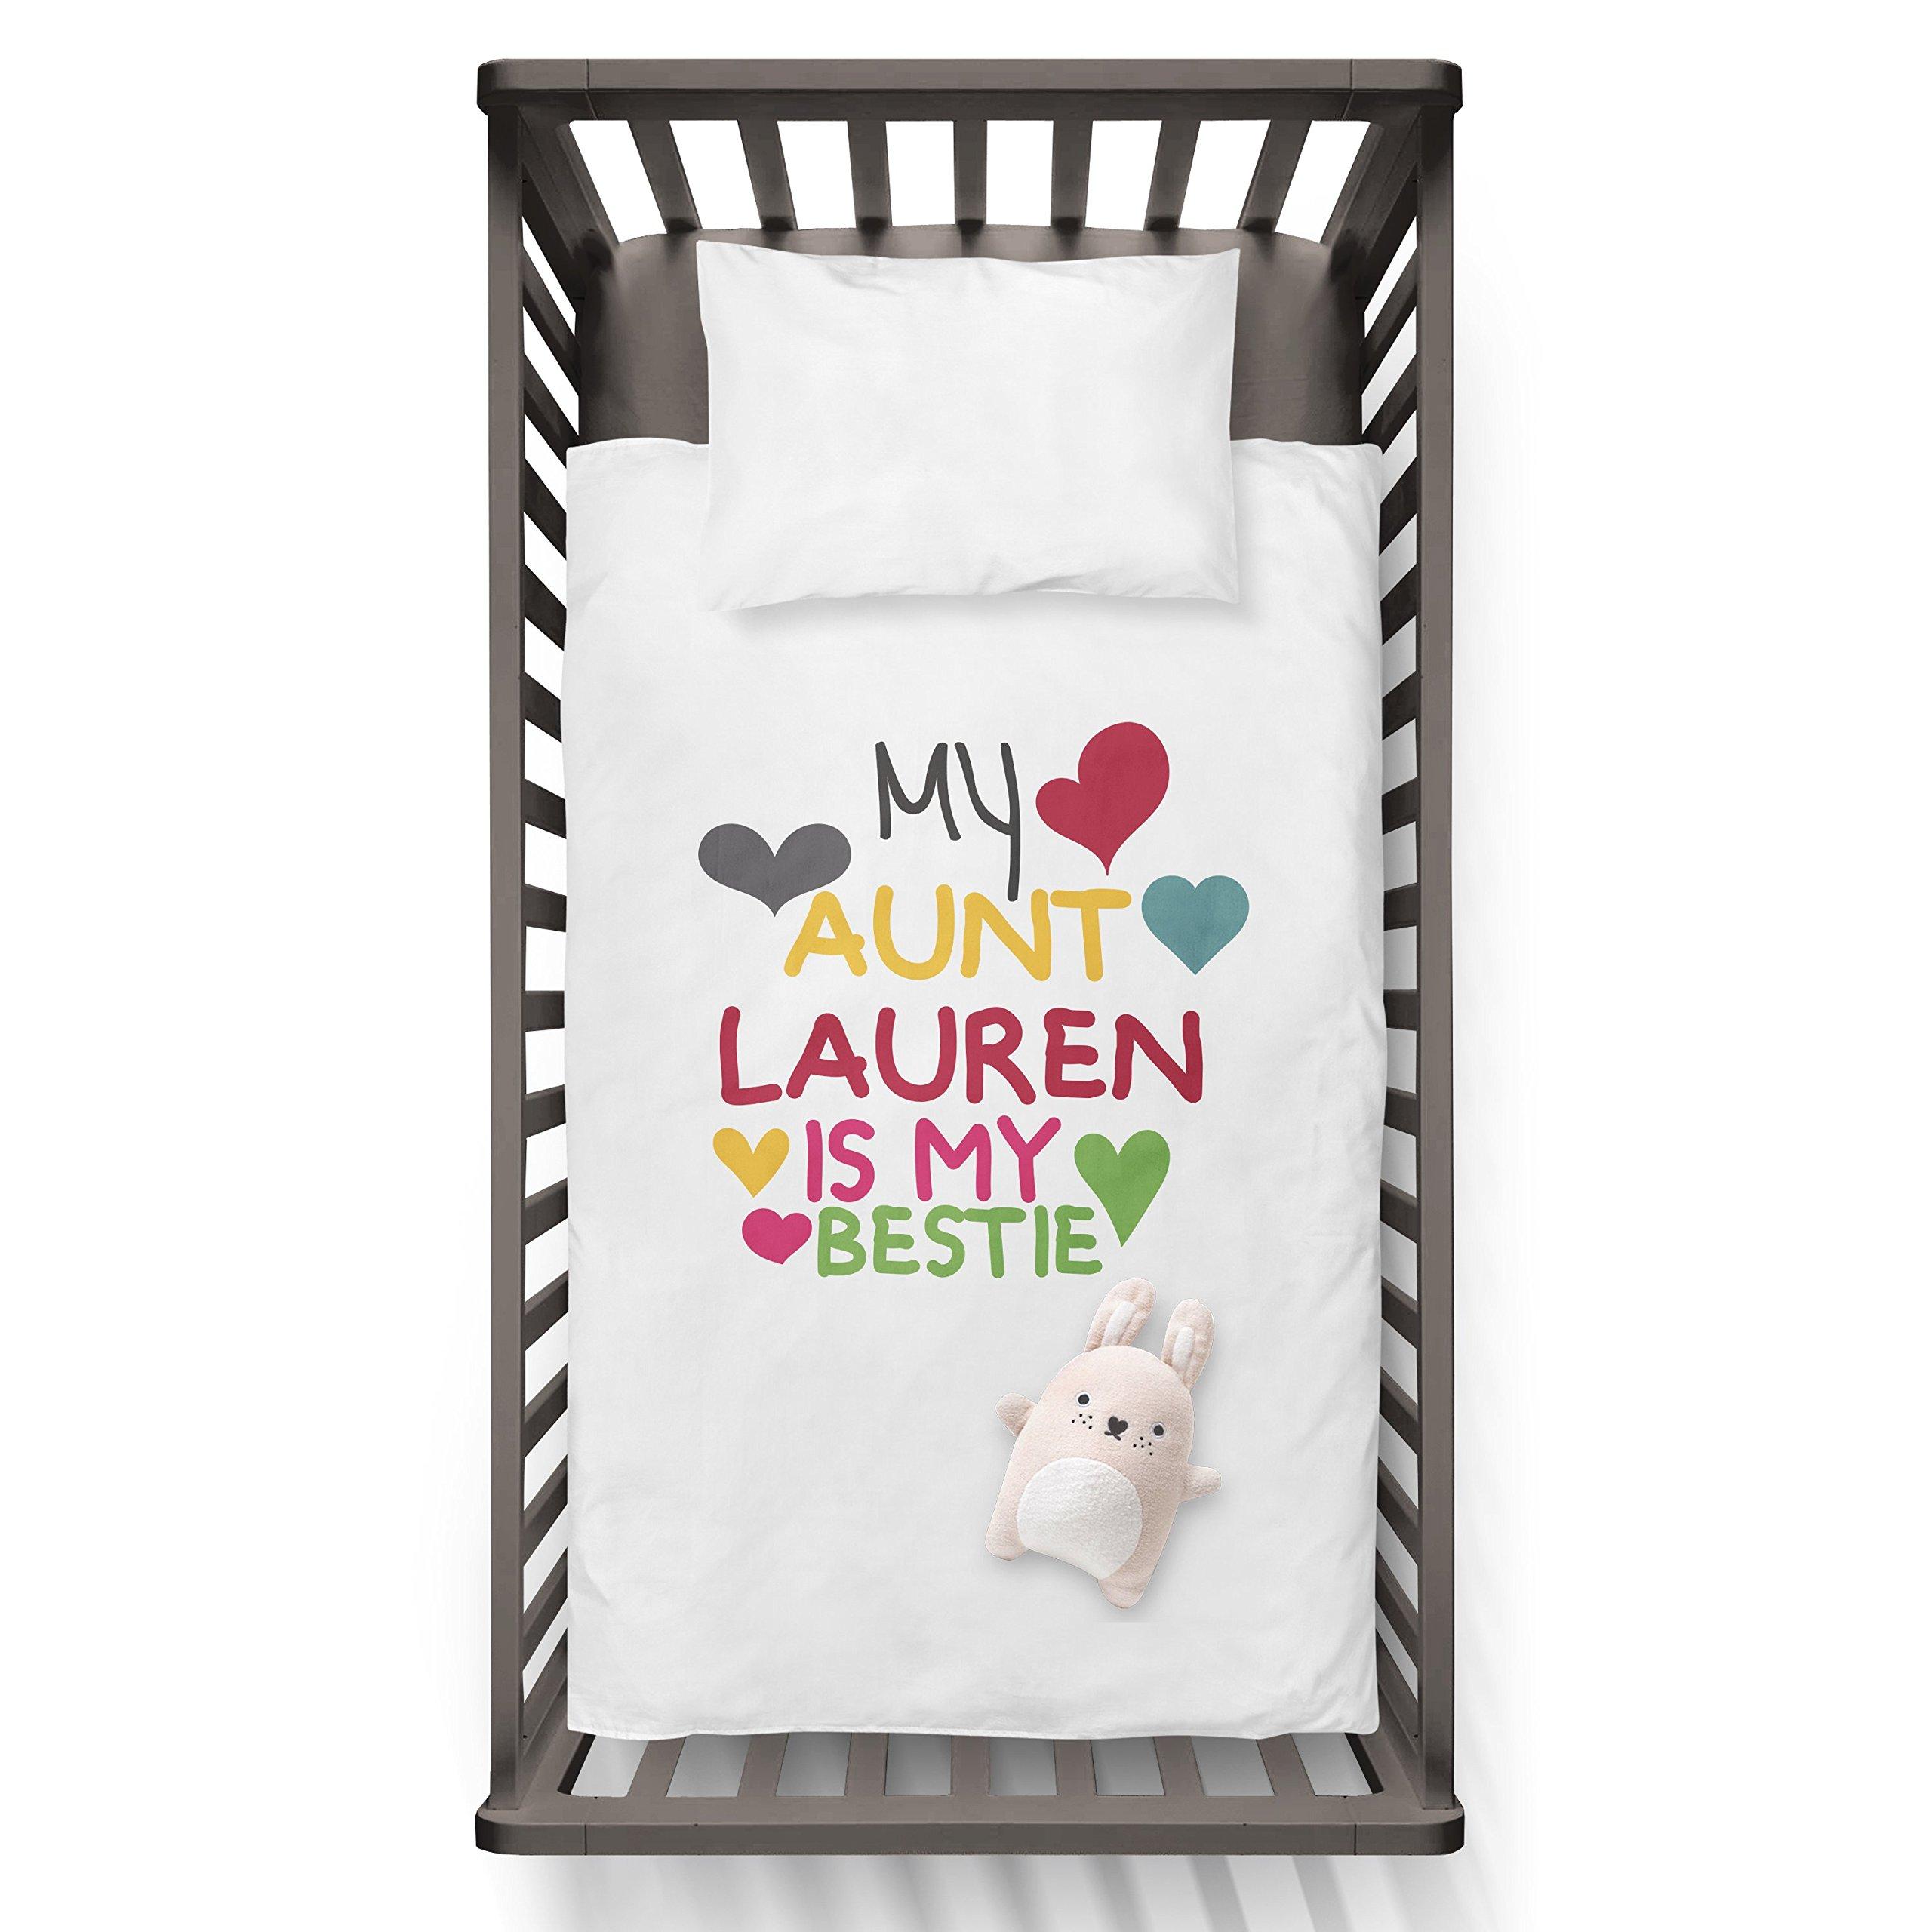 My Aunt Lauren (any name) Is My Bestie Funny Humor Hip Baby Duvet /Pillow set,Toddler Duvet,Oeko-Tex,Personalized duvet and pillow,Oraganic,gift